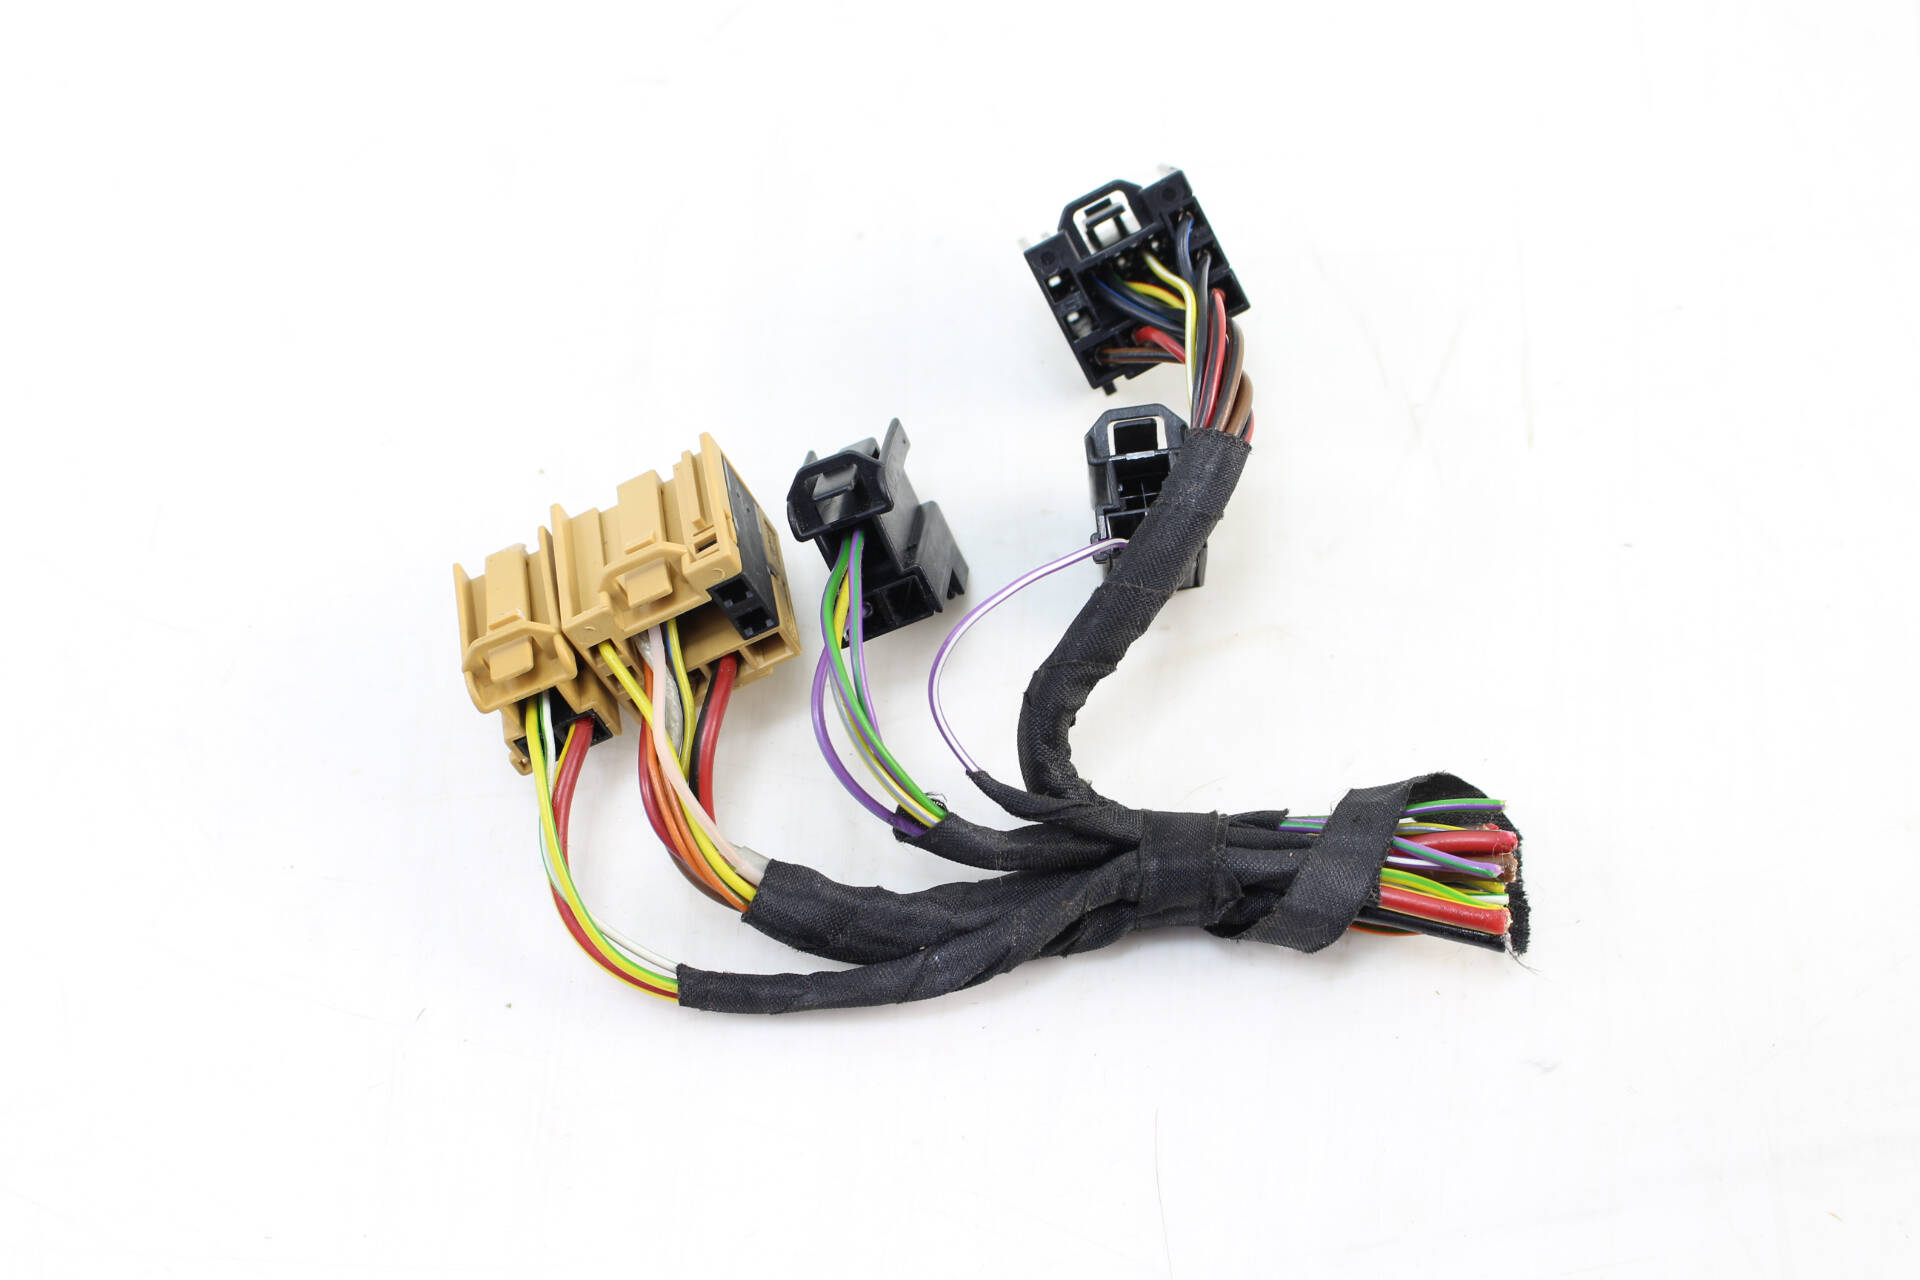 Passat B6 Ccm Wiring Diagram - Somurich com